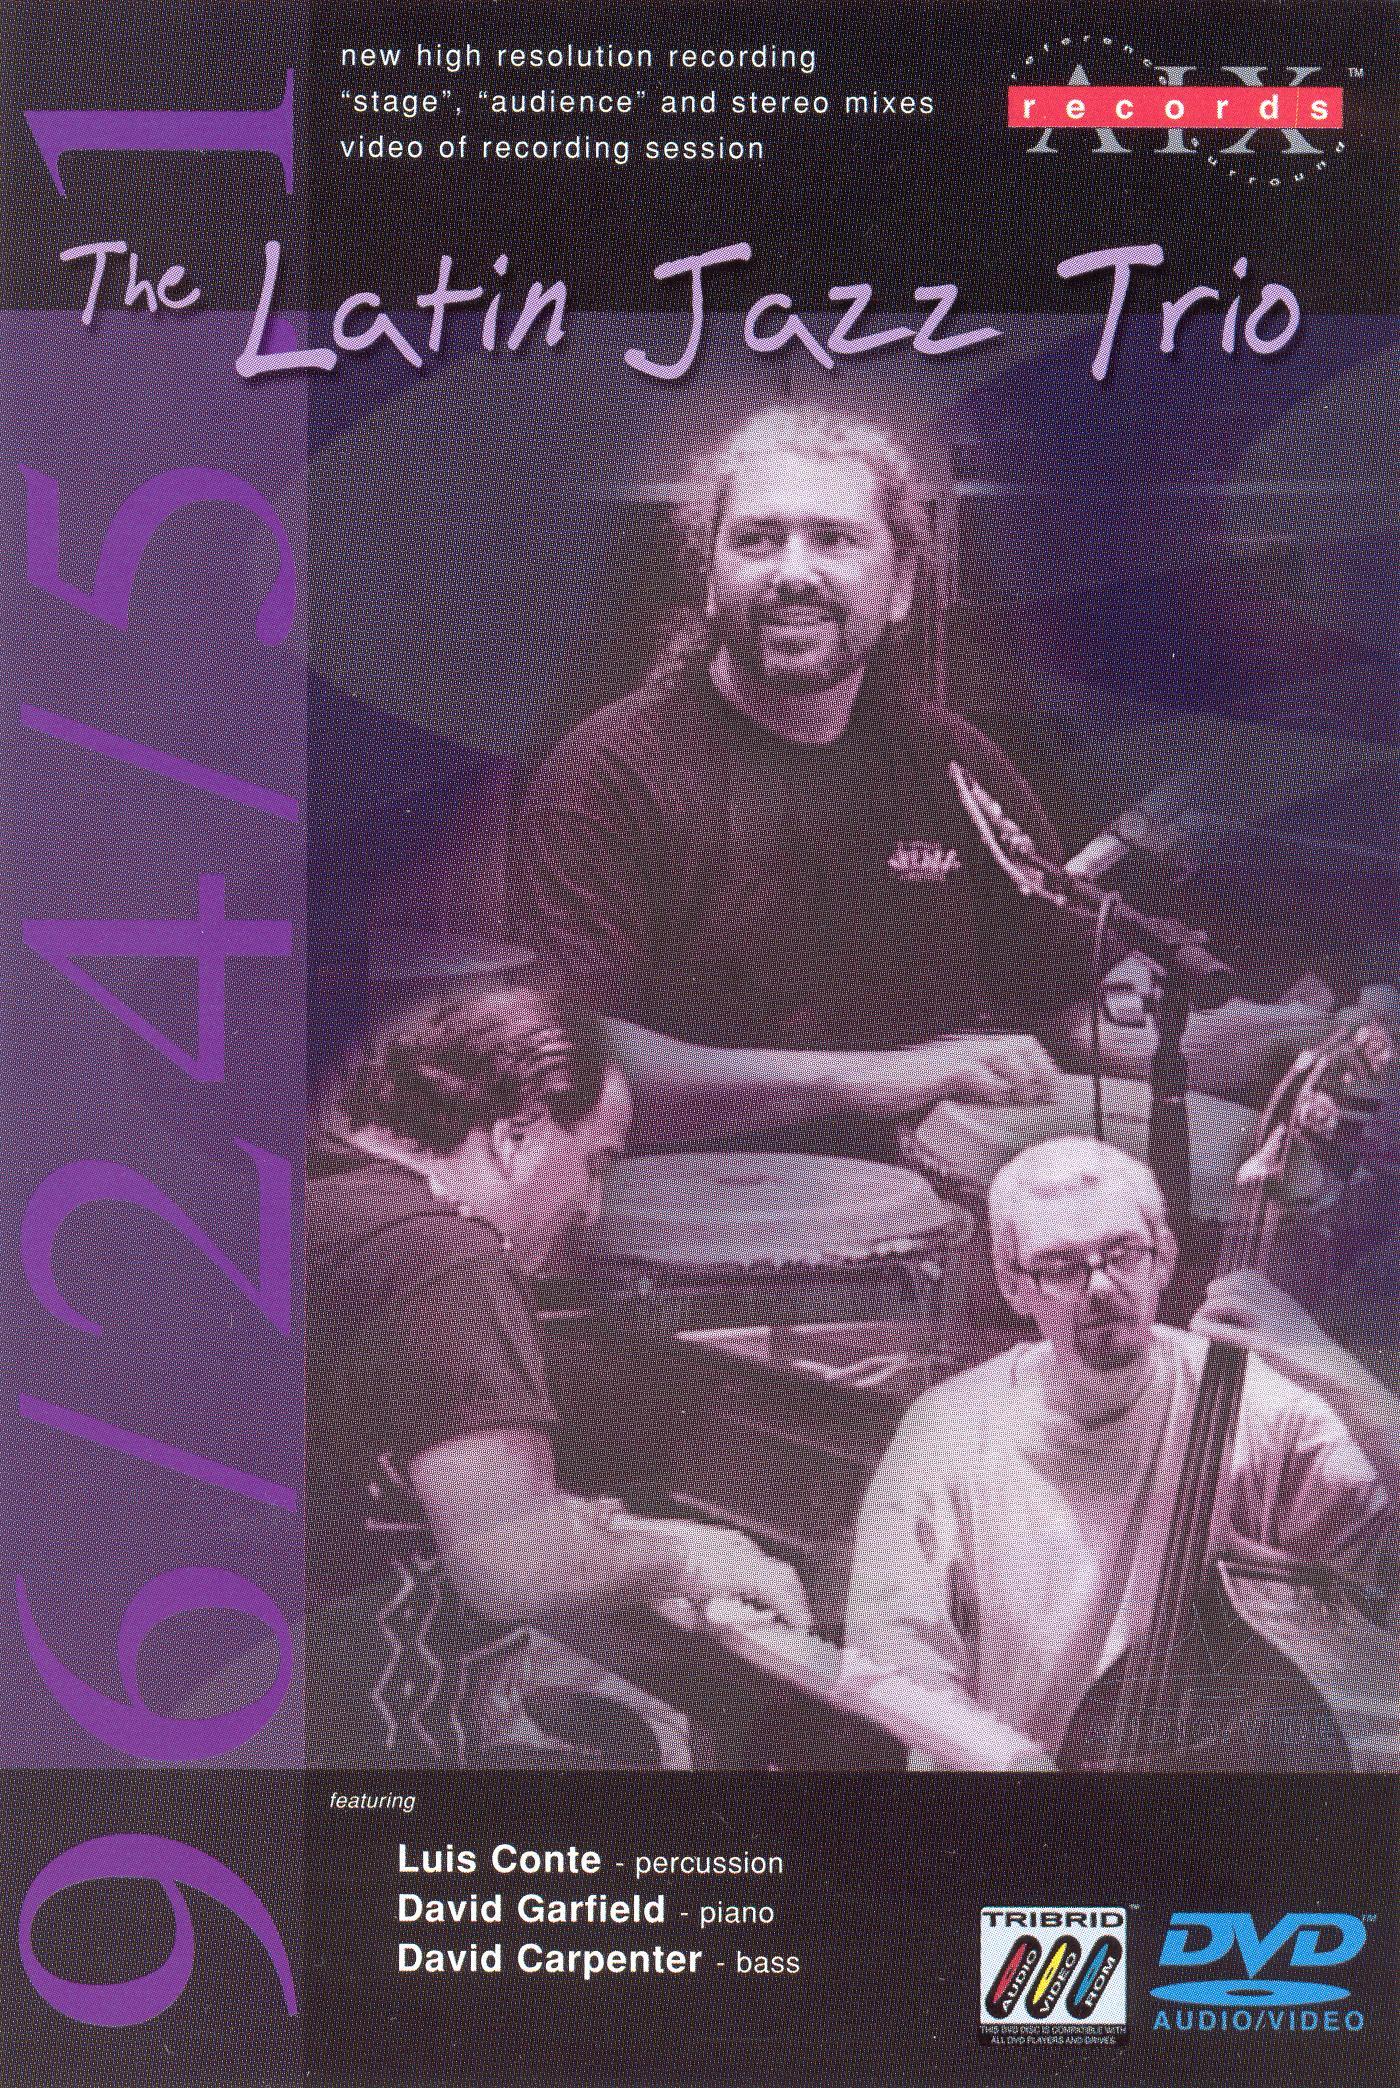 The Latin Jazz Trio